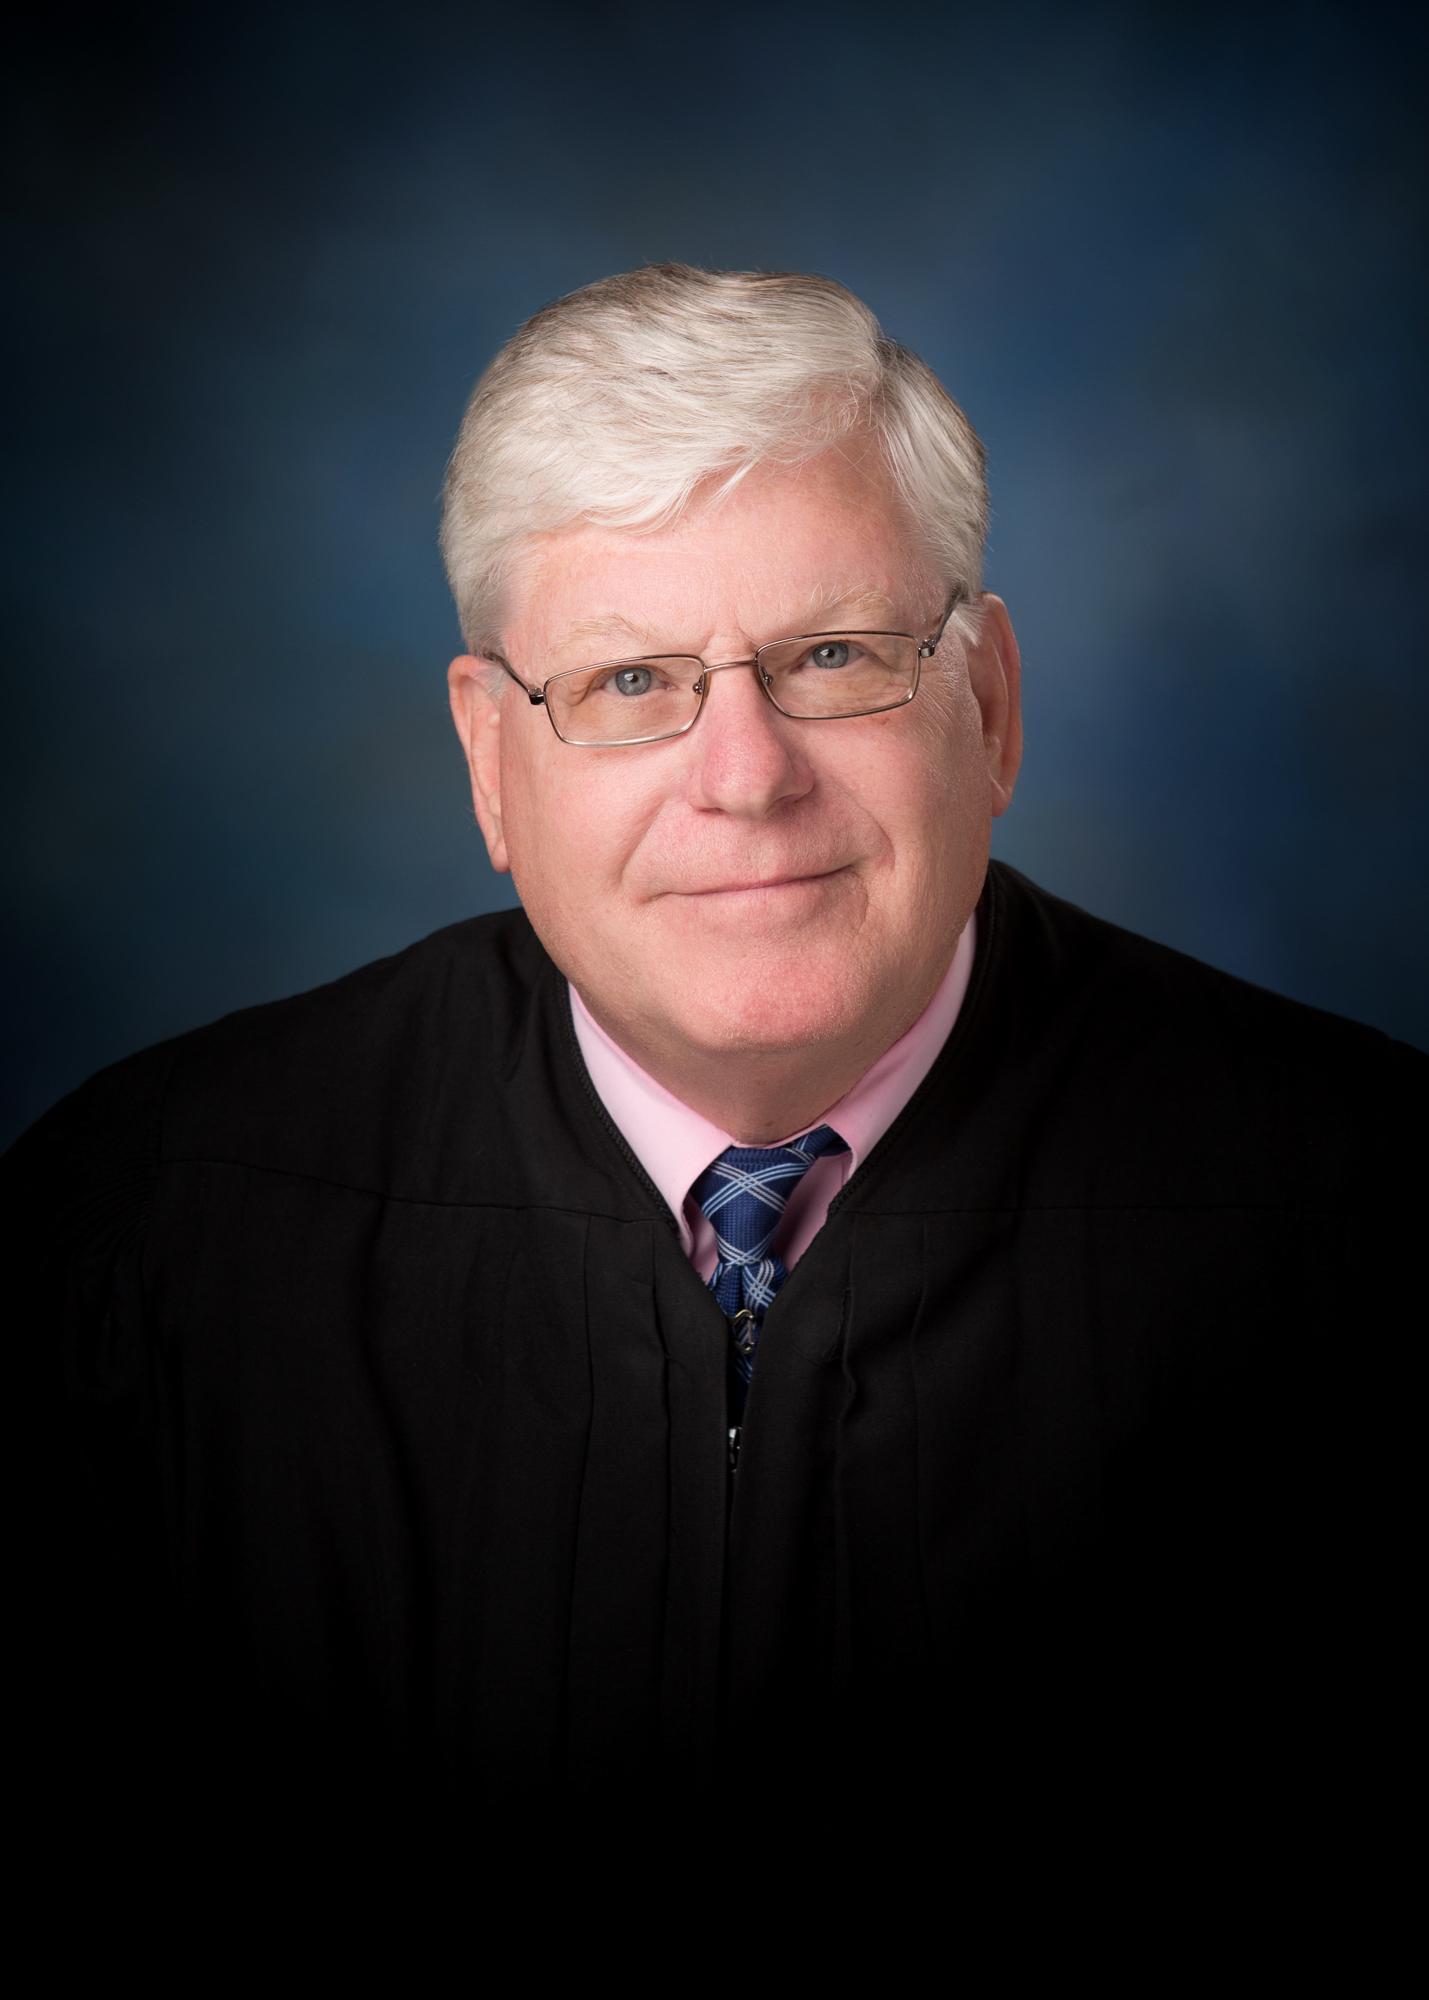 Judge Rick Swartz